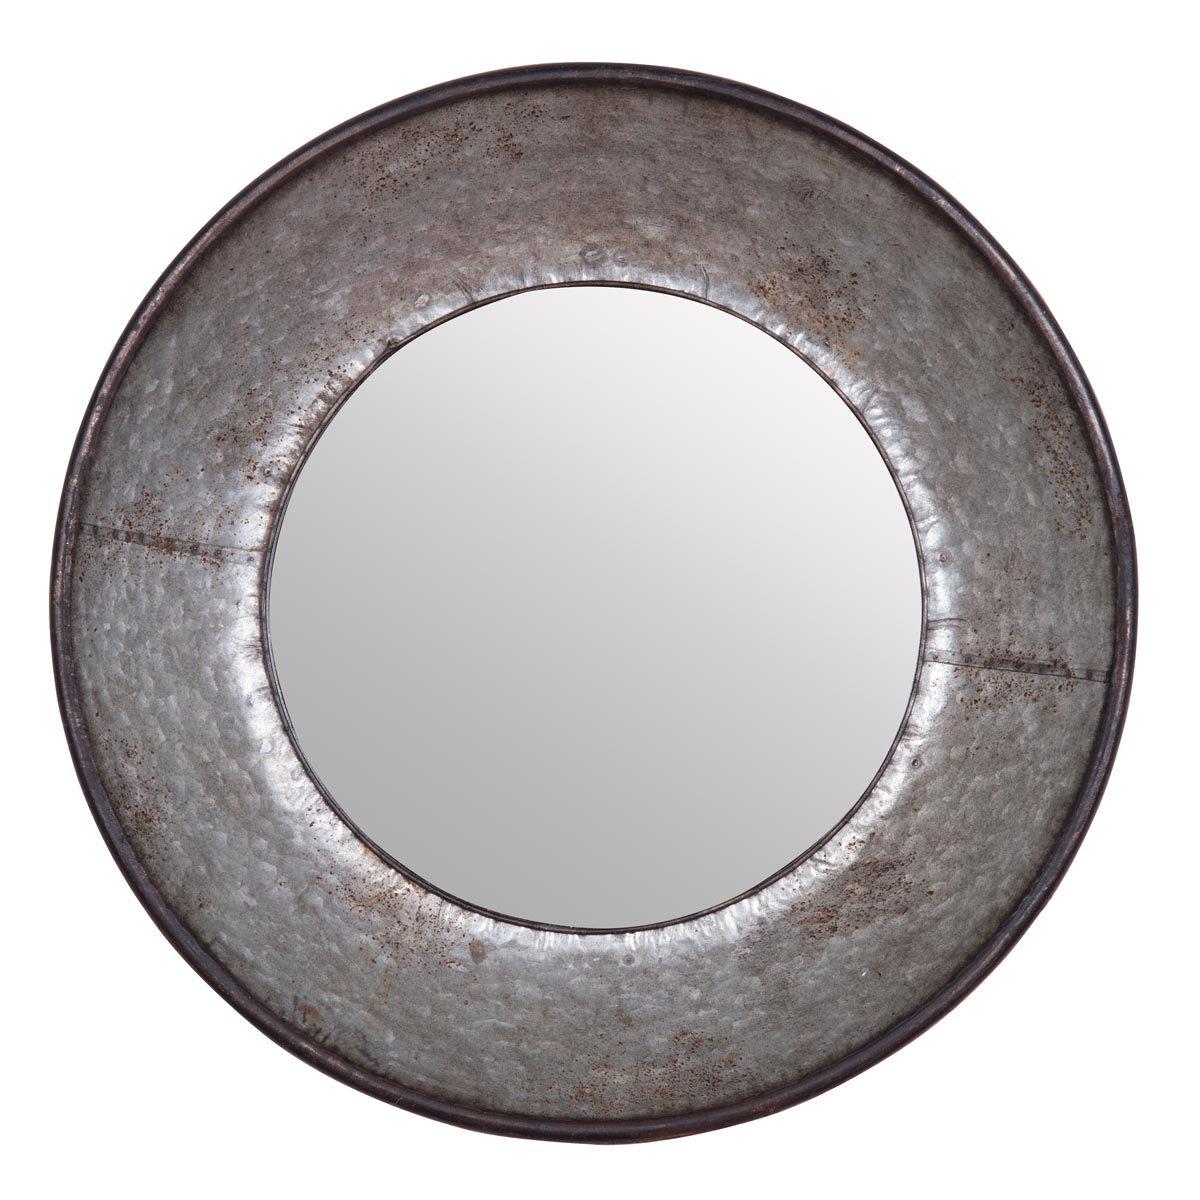 Round Galvanized Metallic Wall Mirrors For Favorite Galvanized Round Accent Wall Mirror (View 5 of 20)